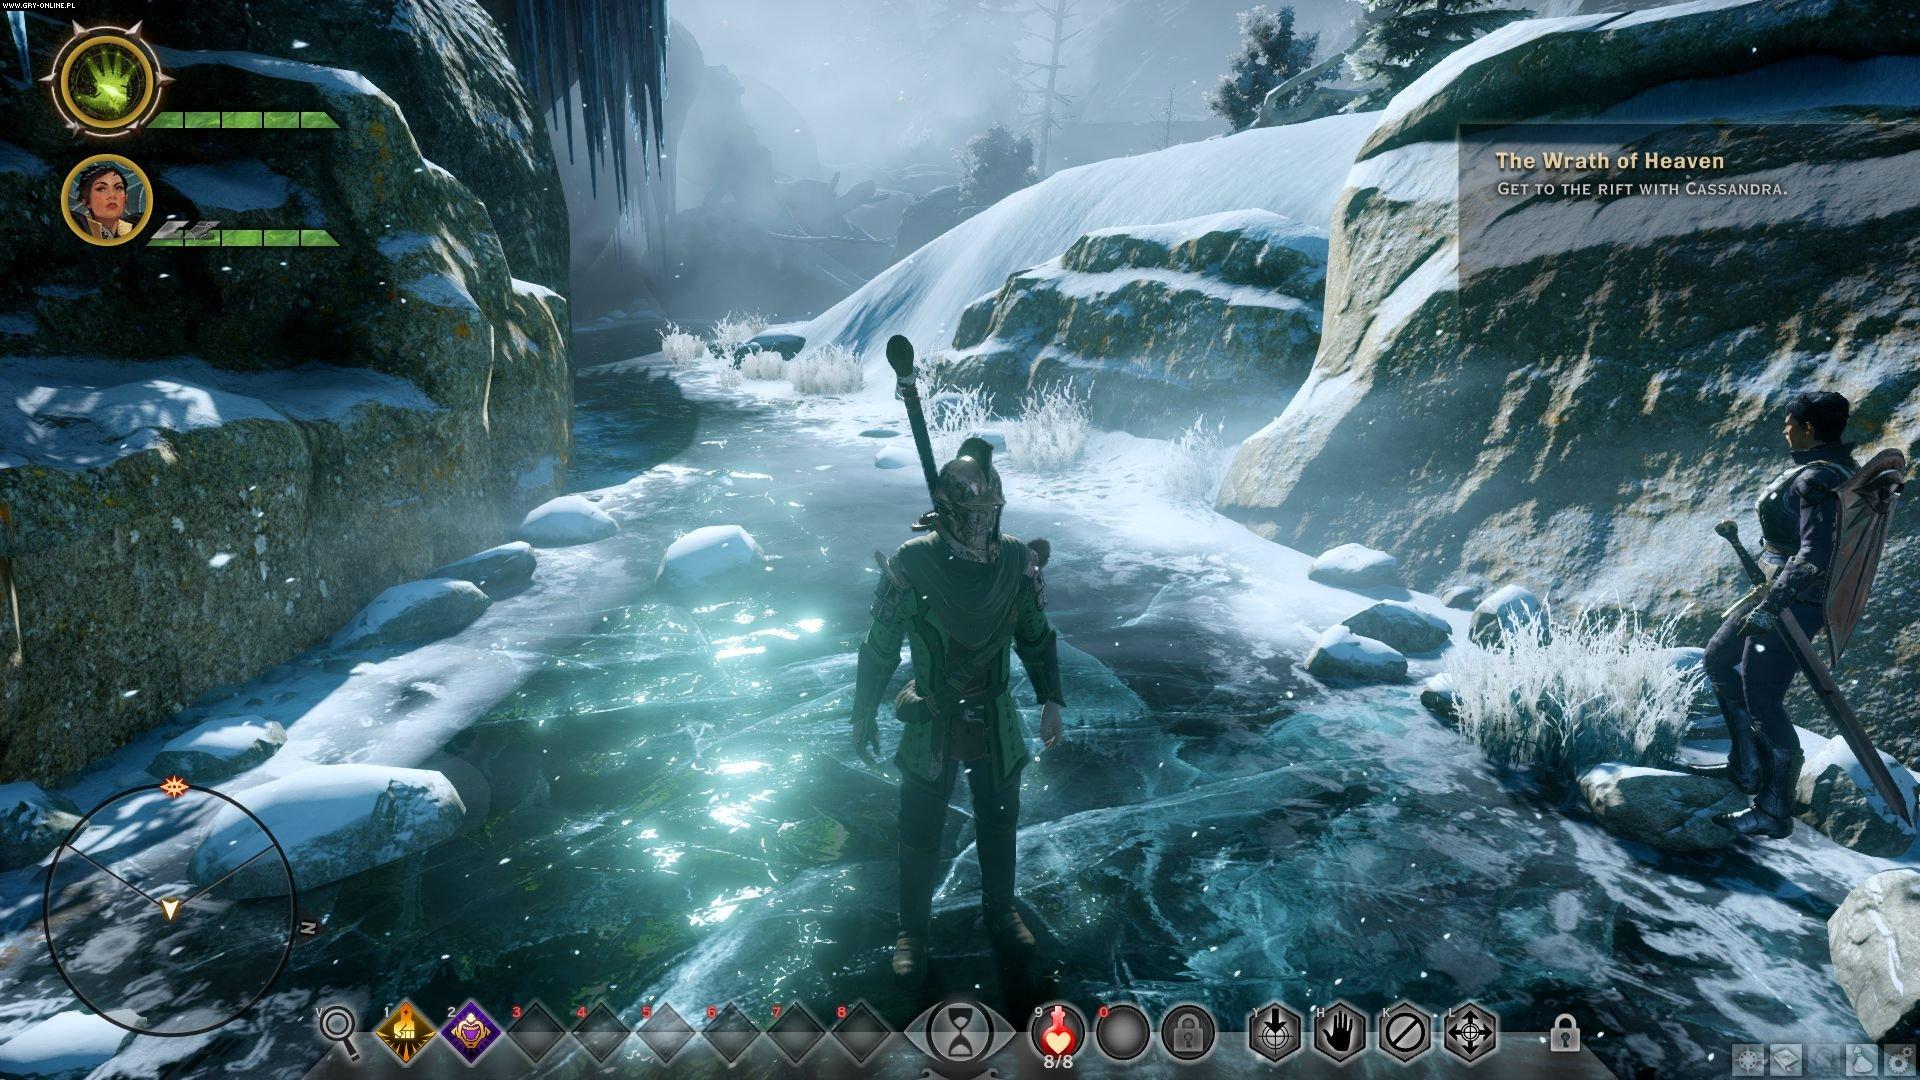 Dragon Age: Inquisition PC, X360, PS3 Games Image 2/225, BioWare Corporation, Electronic Arts Inc.